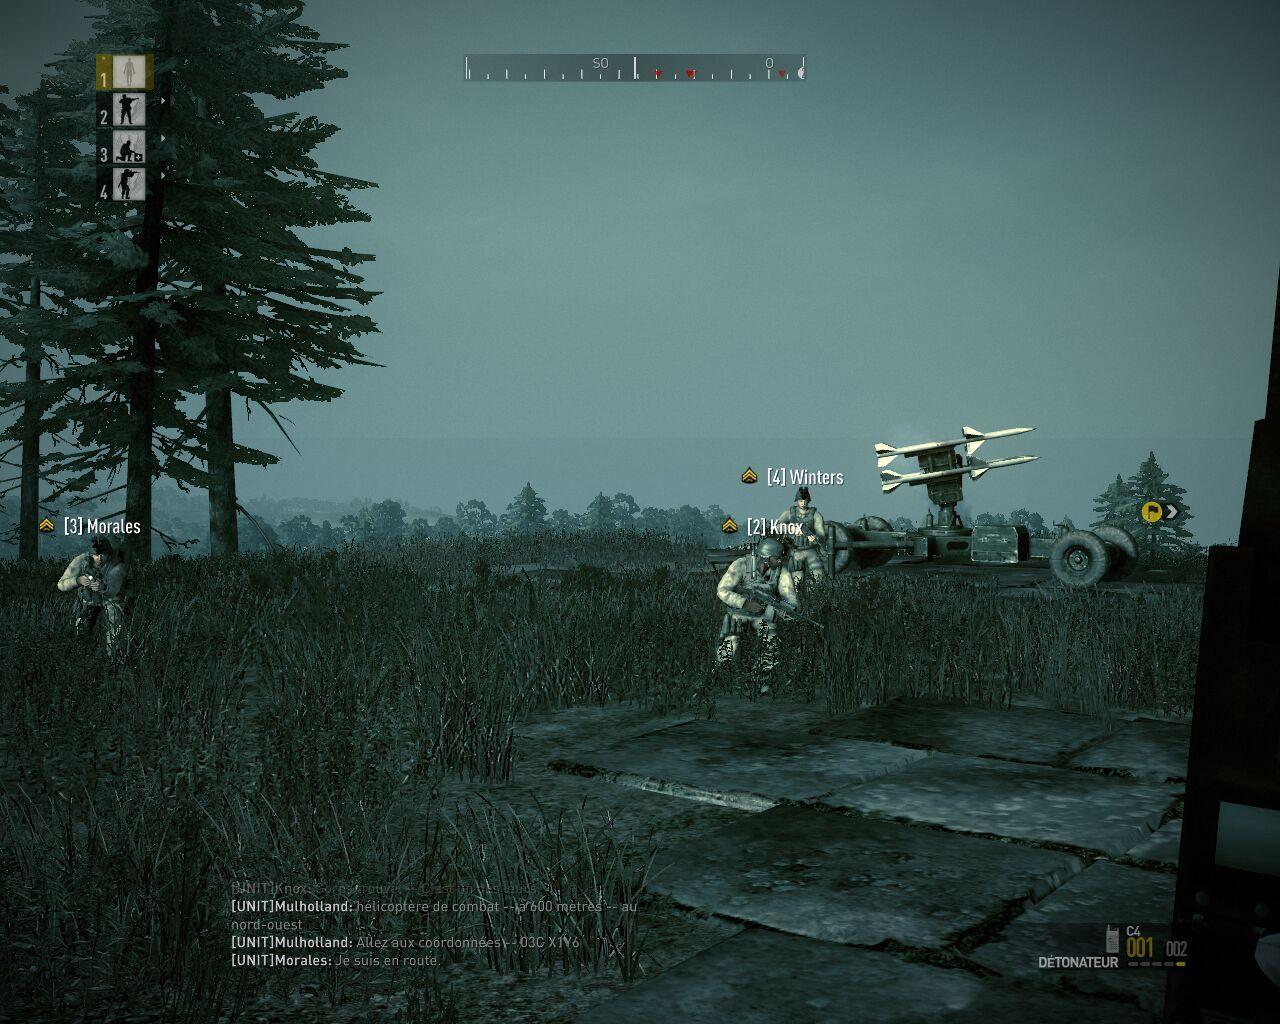 2014 - Кряк operation flashpoint dragon rising МОБЙЛЕ-ХЕЛПЕР.РУ.